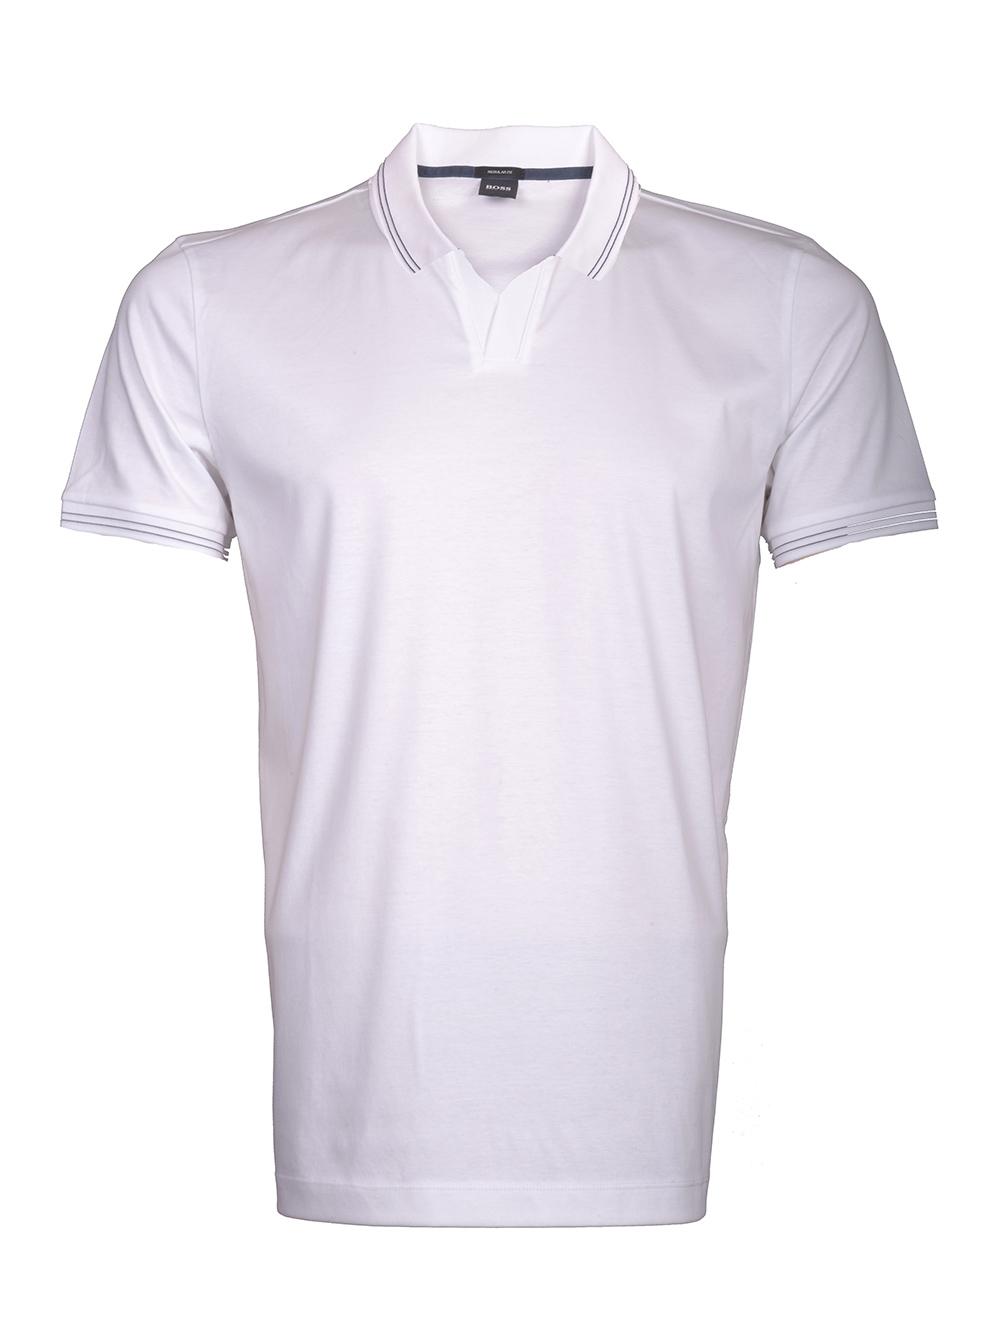 BOSS Μπλούζα Polo PARLAY30 50386213 ΛΕΥΚΟ